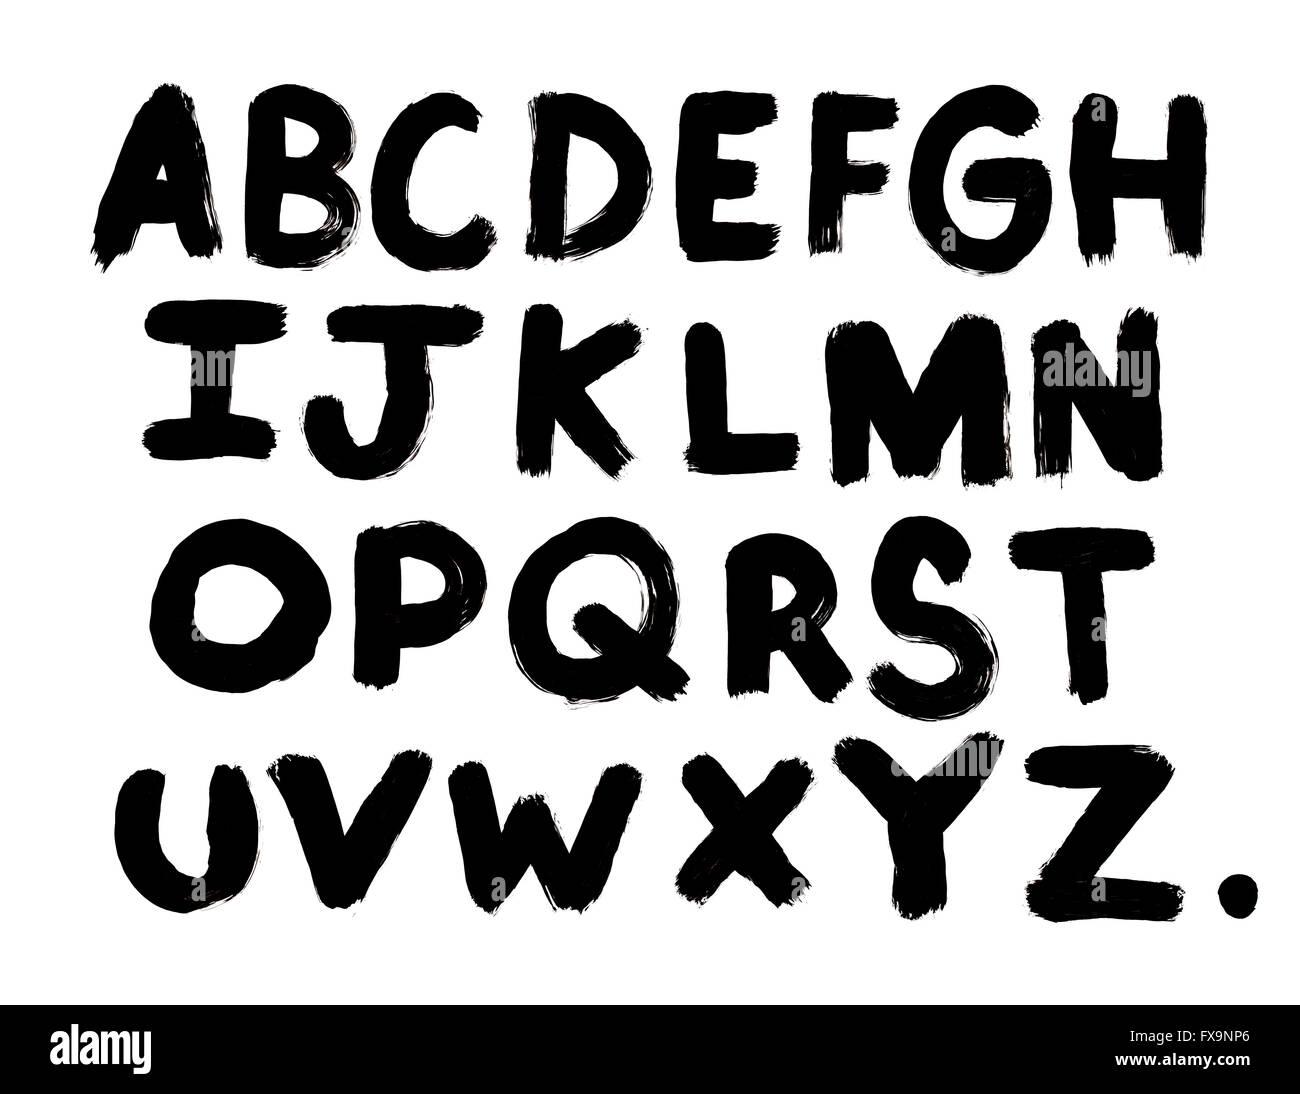 Schwarzer Farbe Pinsel Buchstaben Isolated on White Background. Stockbild